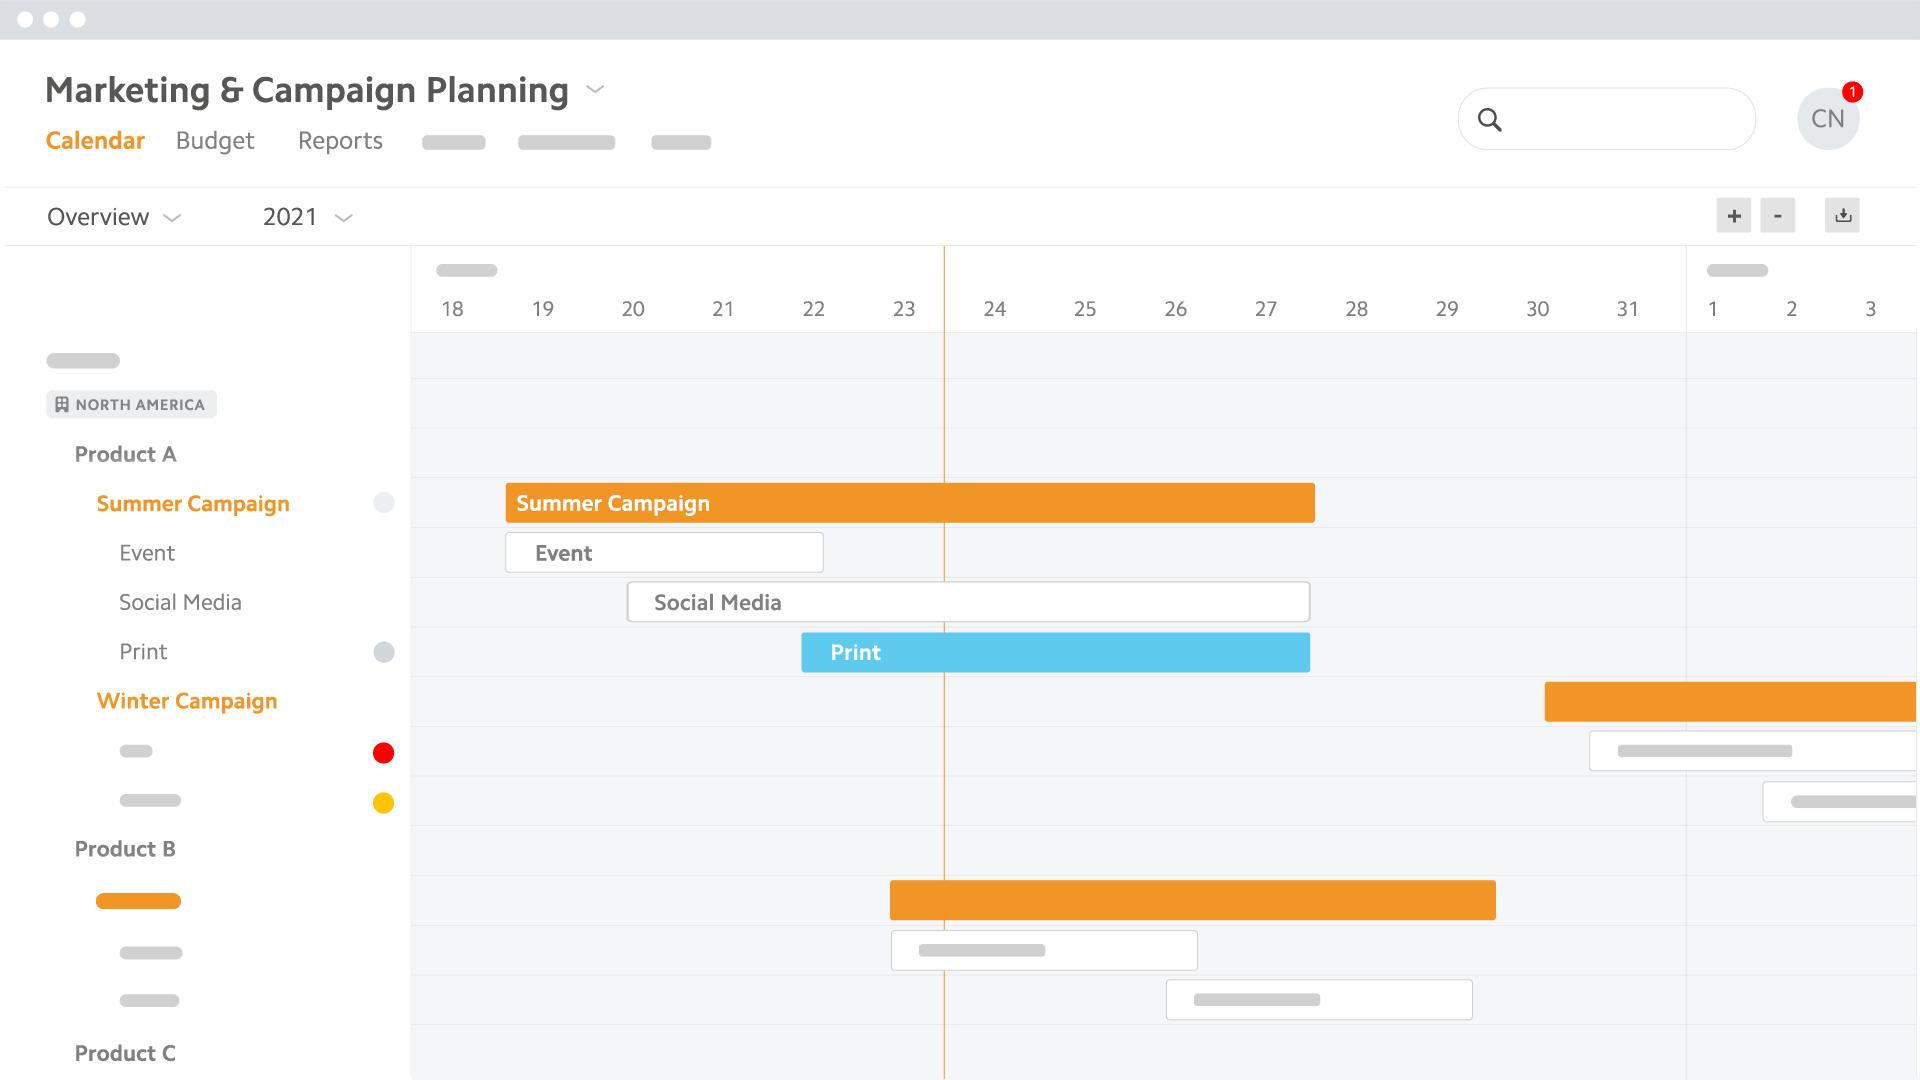 BrandMaker Marketing & Campaign Planning